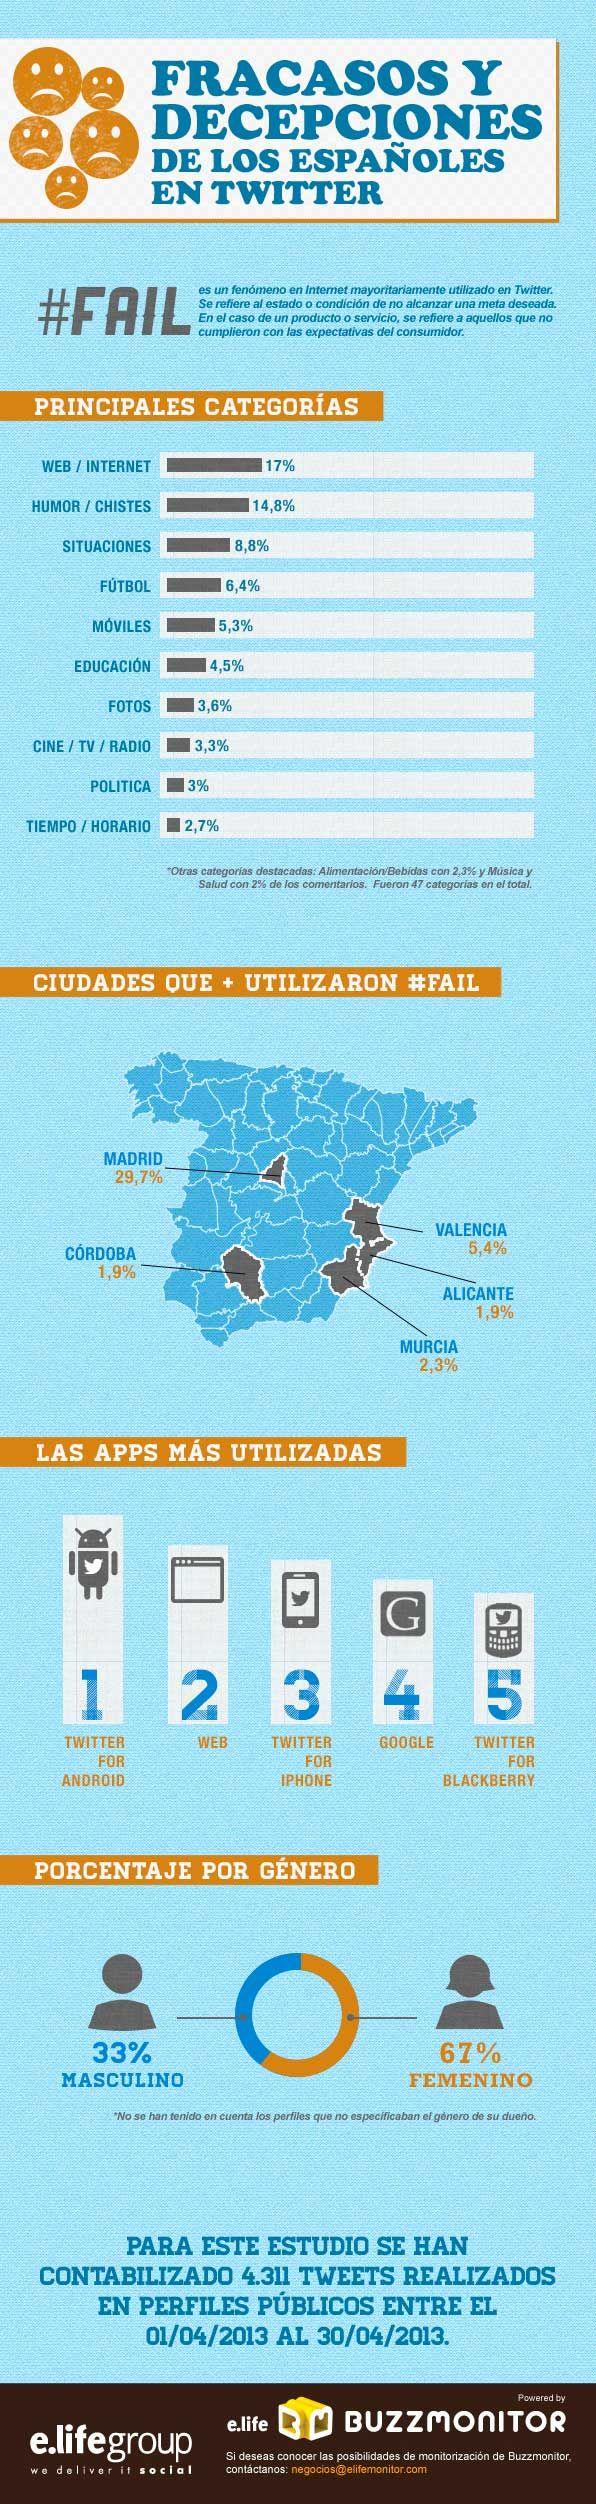 Uso del hashtag #fail en Twitter (España) #infografia